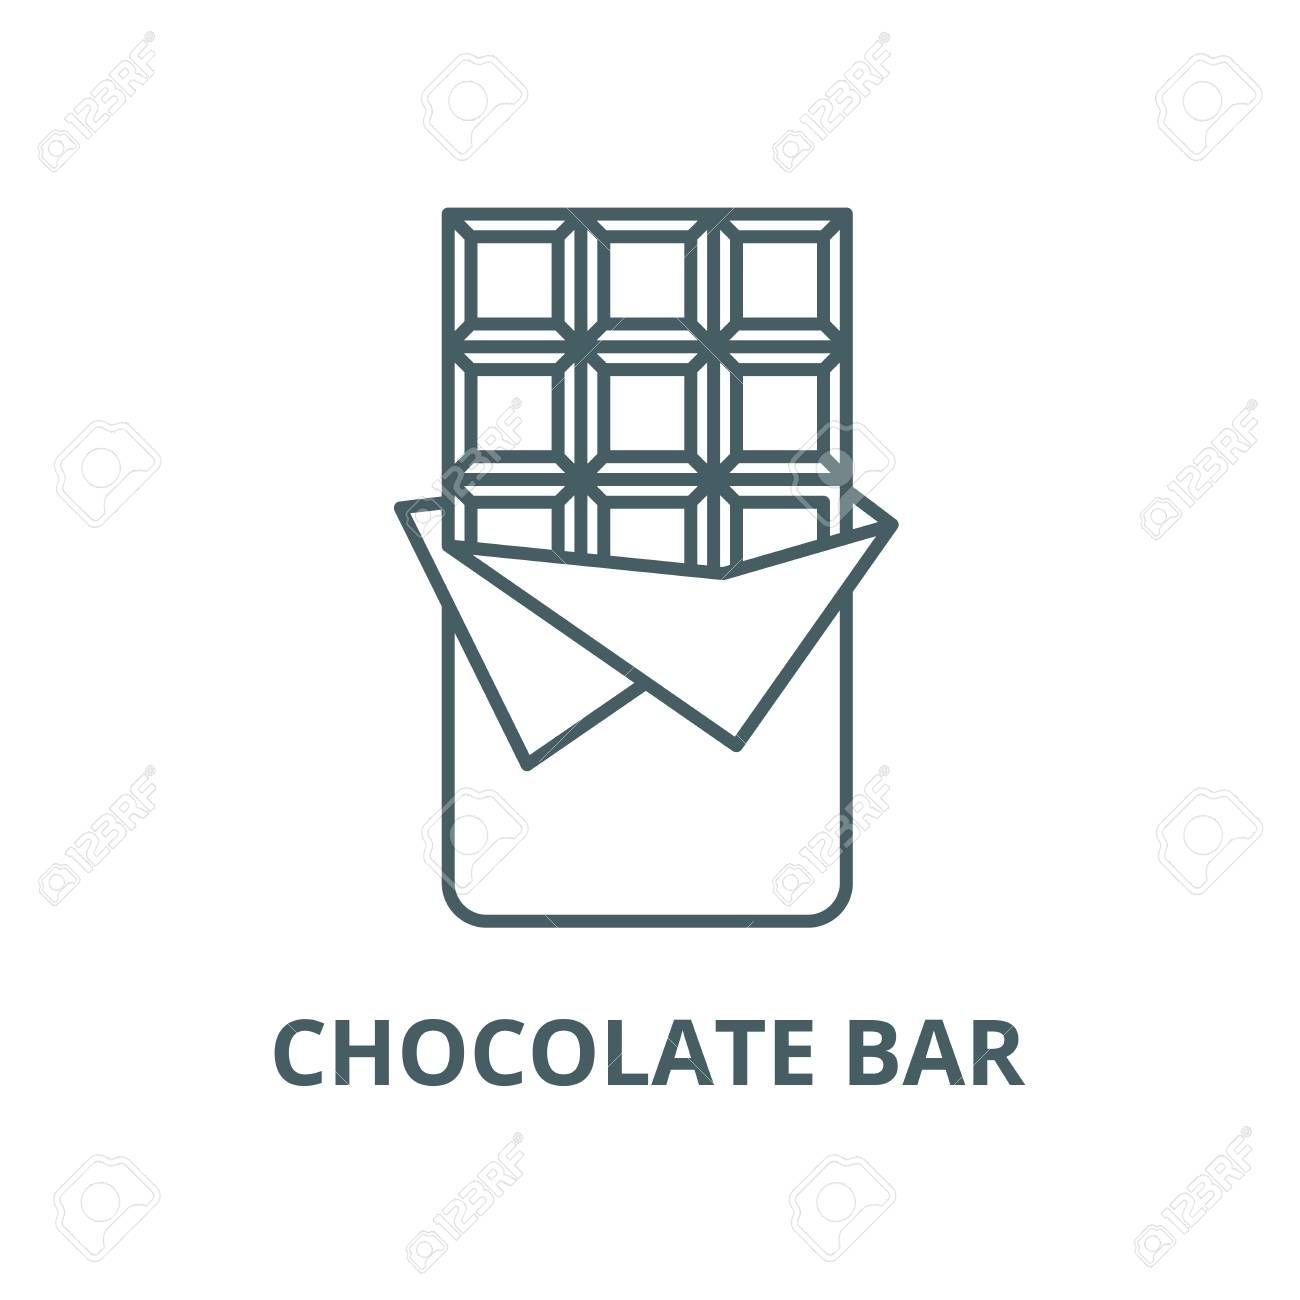 Chocolate Bar Line Icon Vector Chocolate Bar Outline Sign Concept Symbol Illustration Illustration Spon Icon Vector Symbol Logo Symbols Chocolate